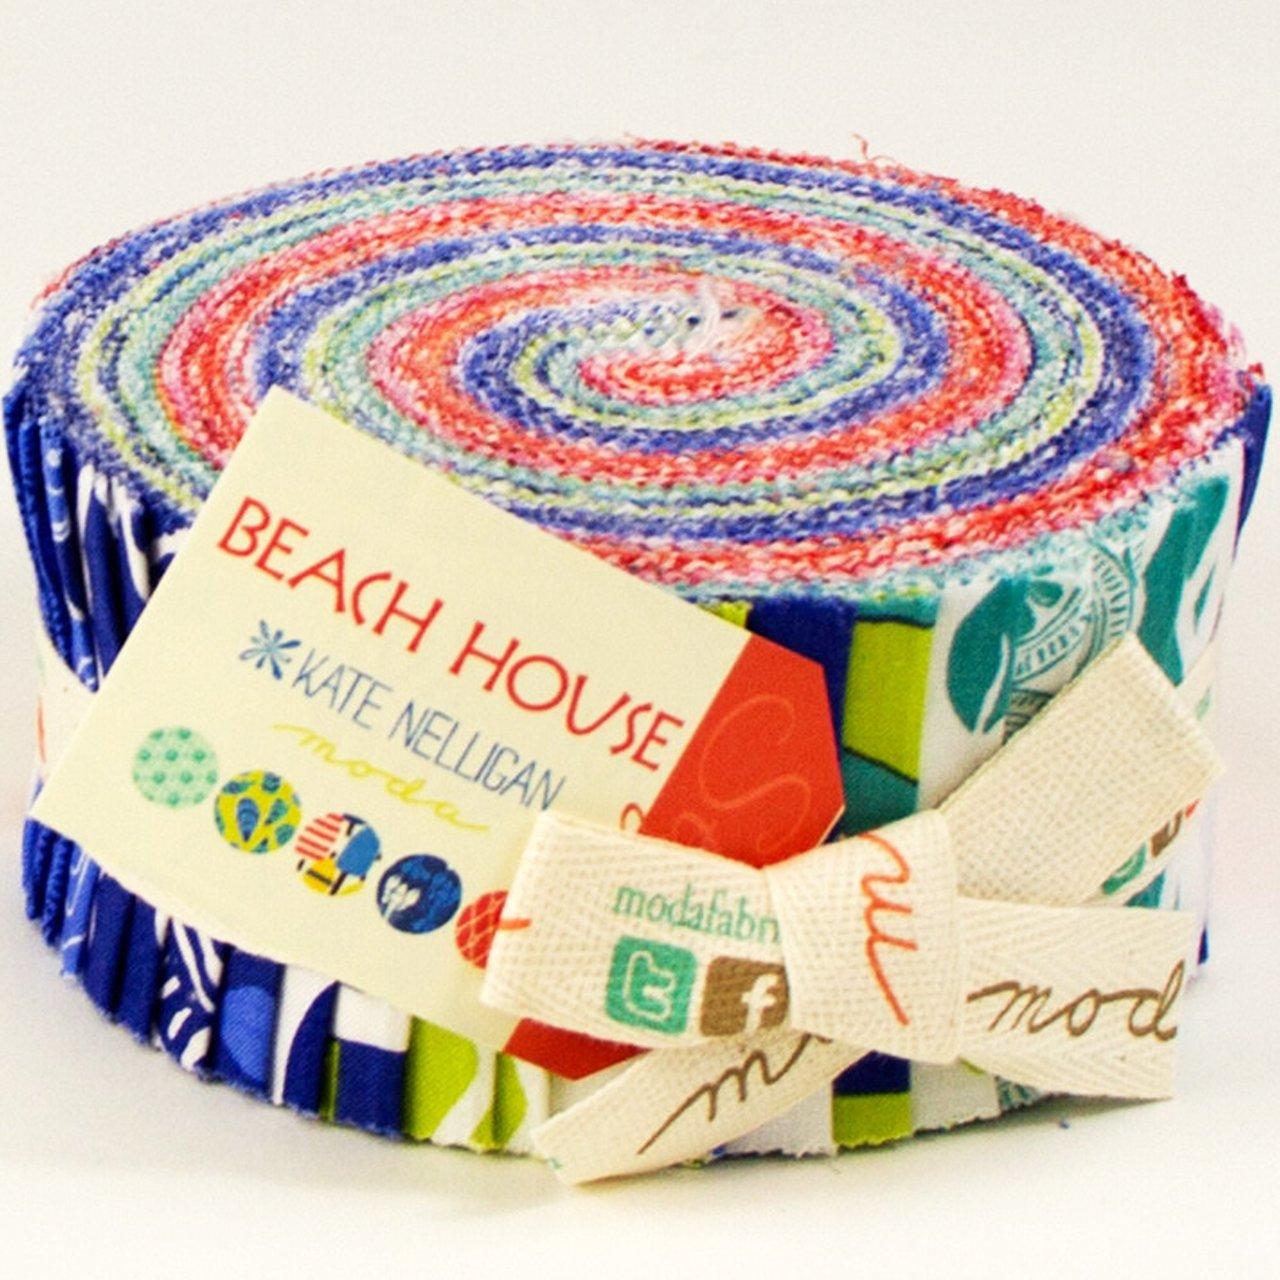 Beach House By Kate Nelligan Moda Jelly Roll, Set of 40 2.5x44-inch (6.4x112cm) Precut Cotton Fabric Strips beach house